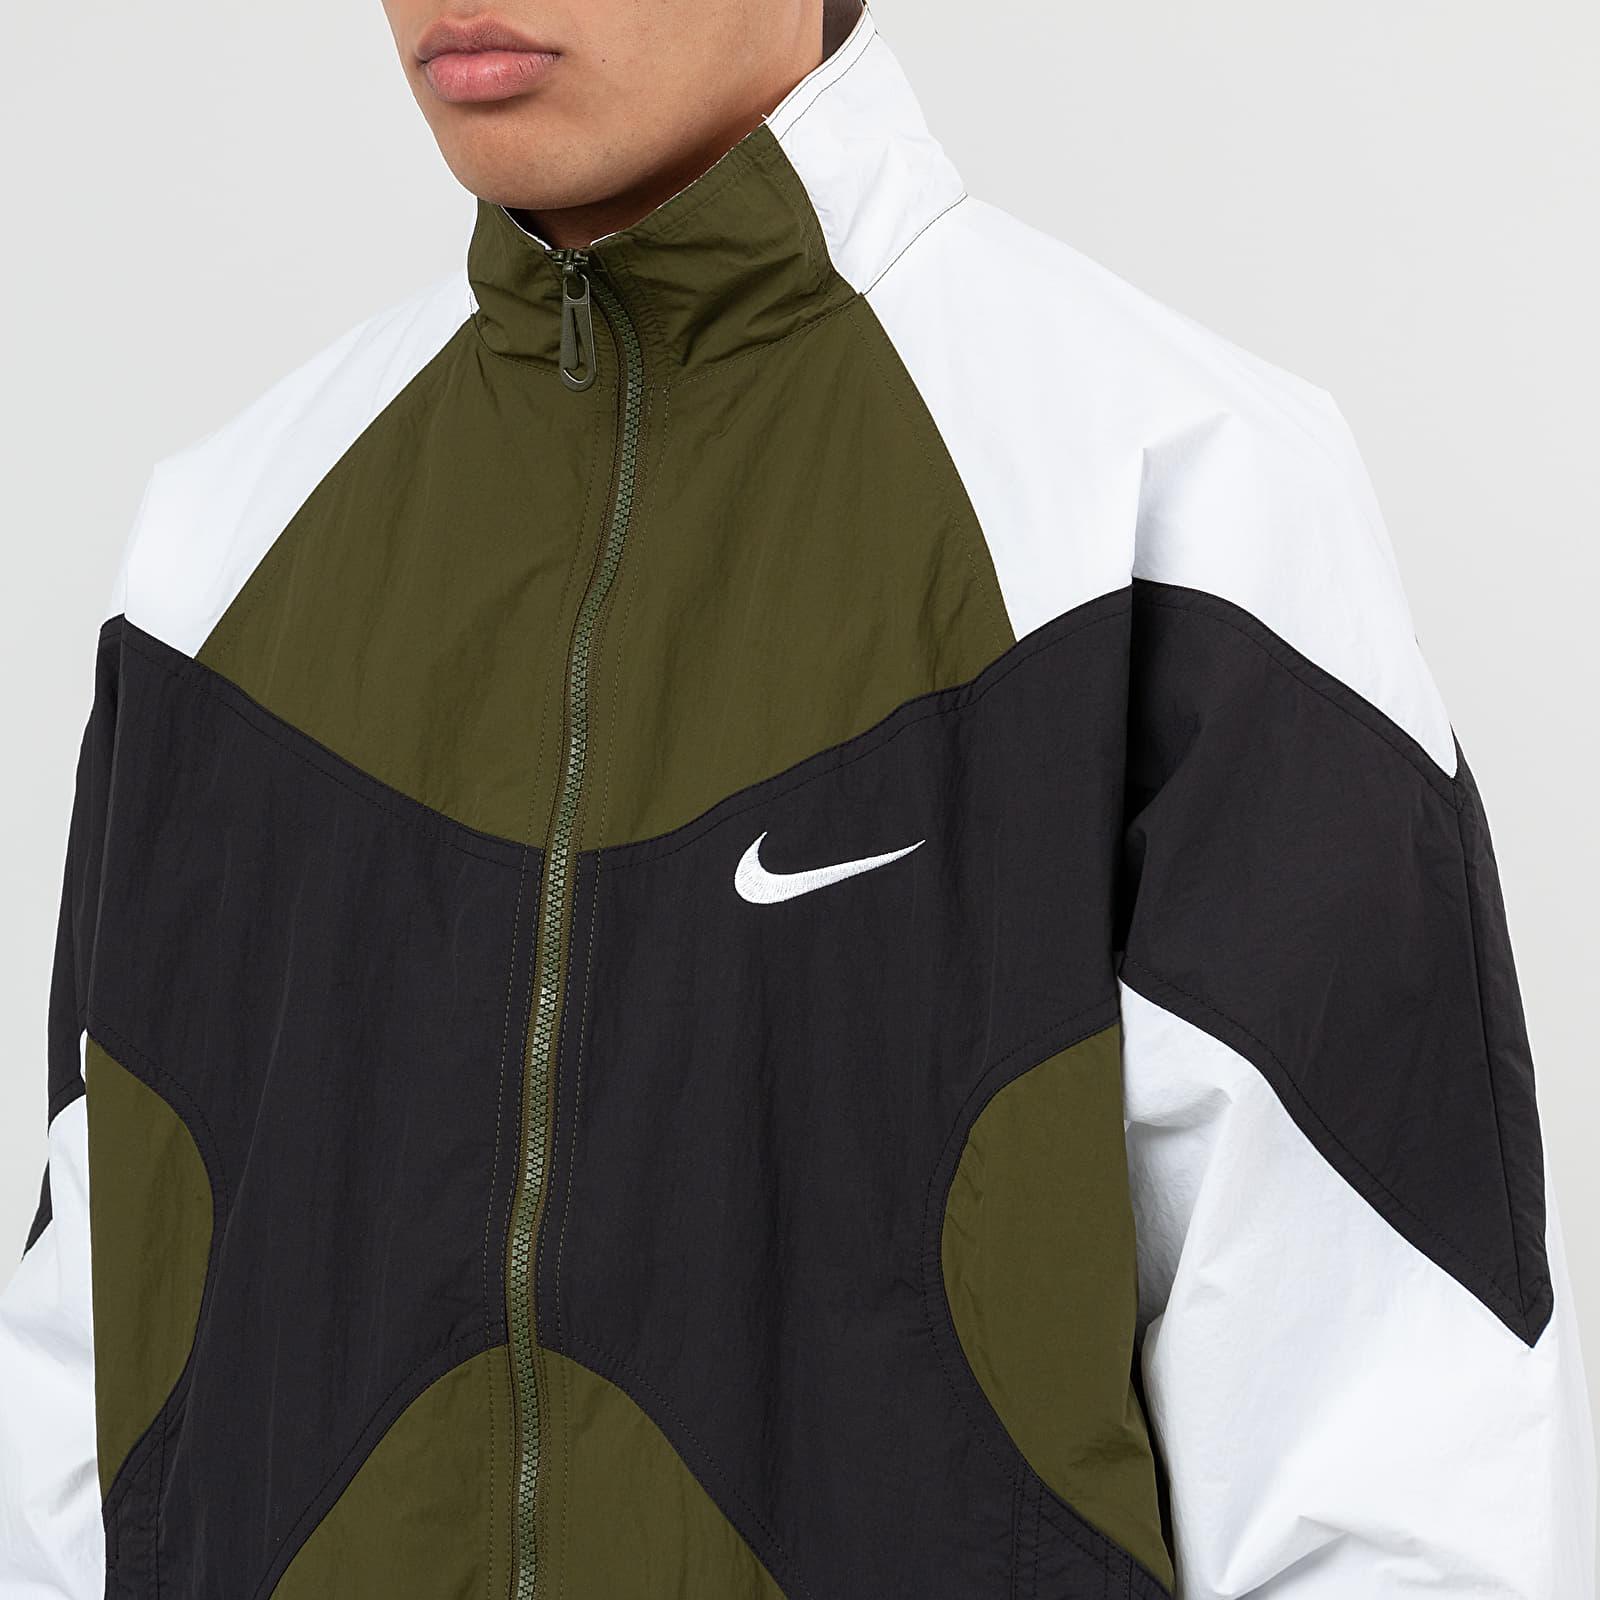 Nike Sportswear Re Issue Jacket Legion Green White Black White   Footshop